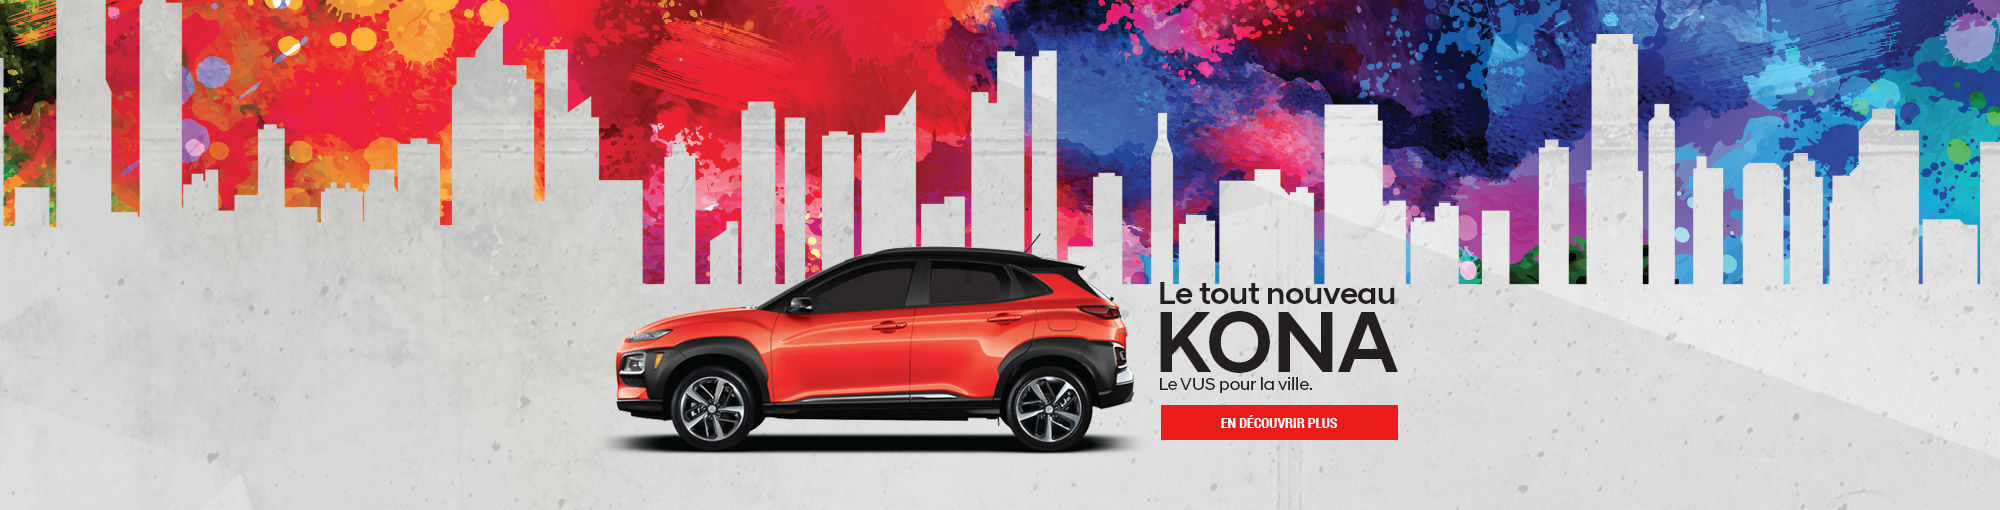 Nouveau Kona 2018 Main Header Mars 2018